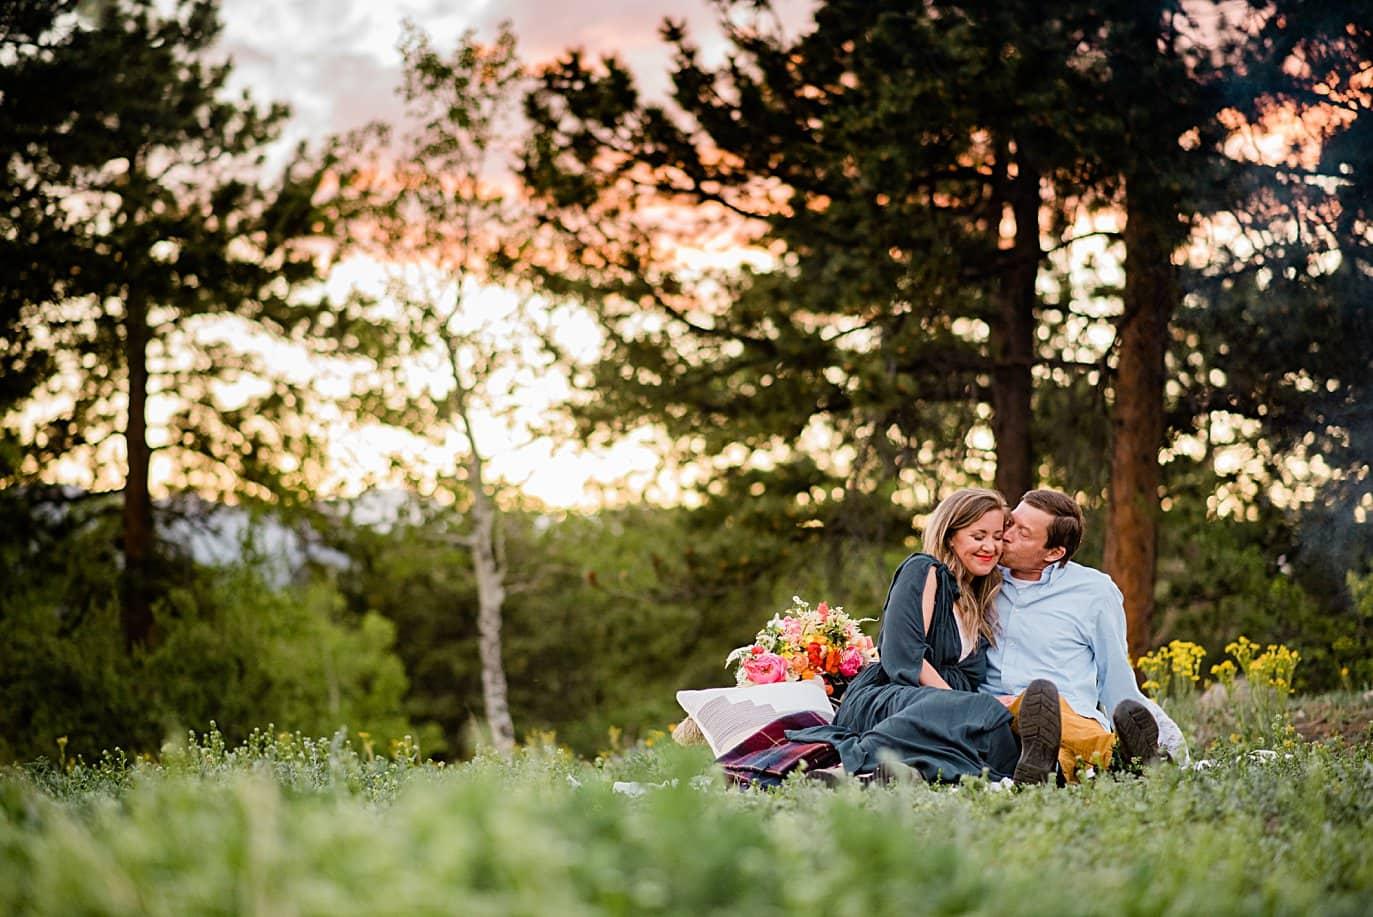 couple cuddles in grass at sunset at Golden elopement by Golden elopement photographer Jennie Crate